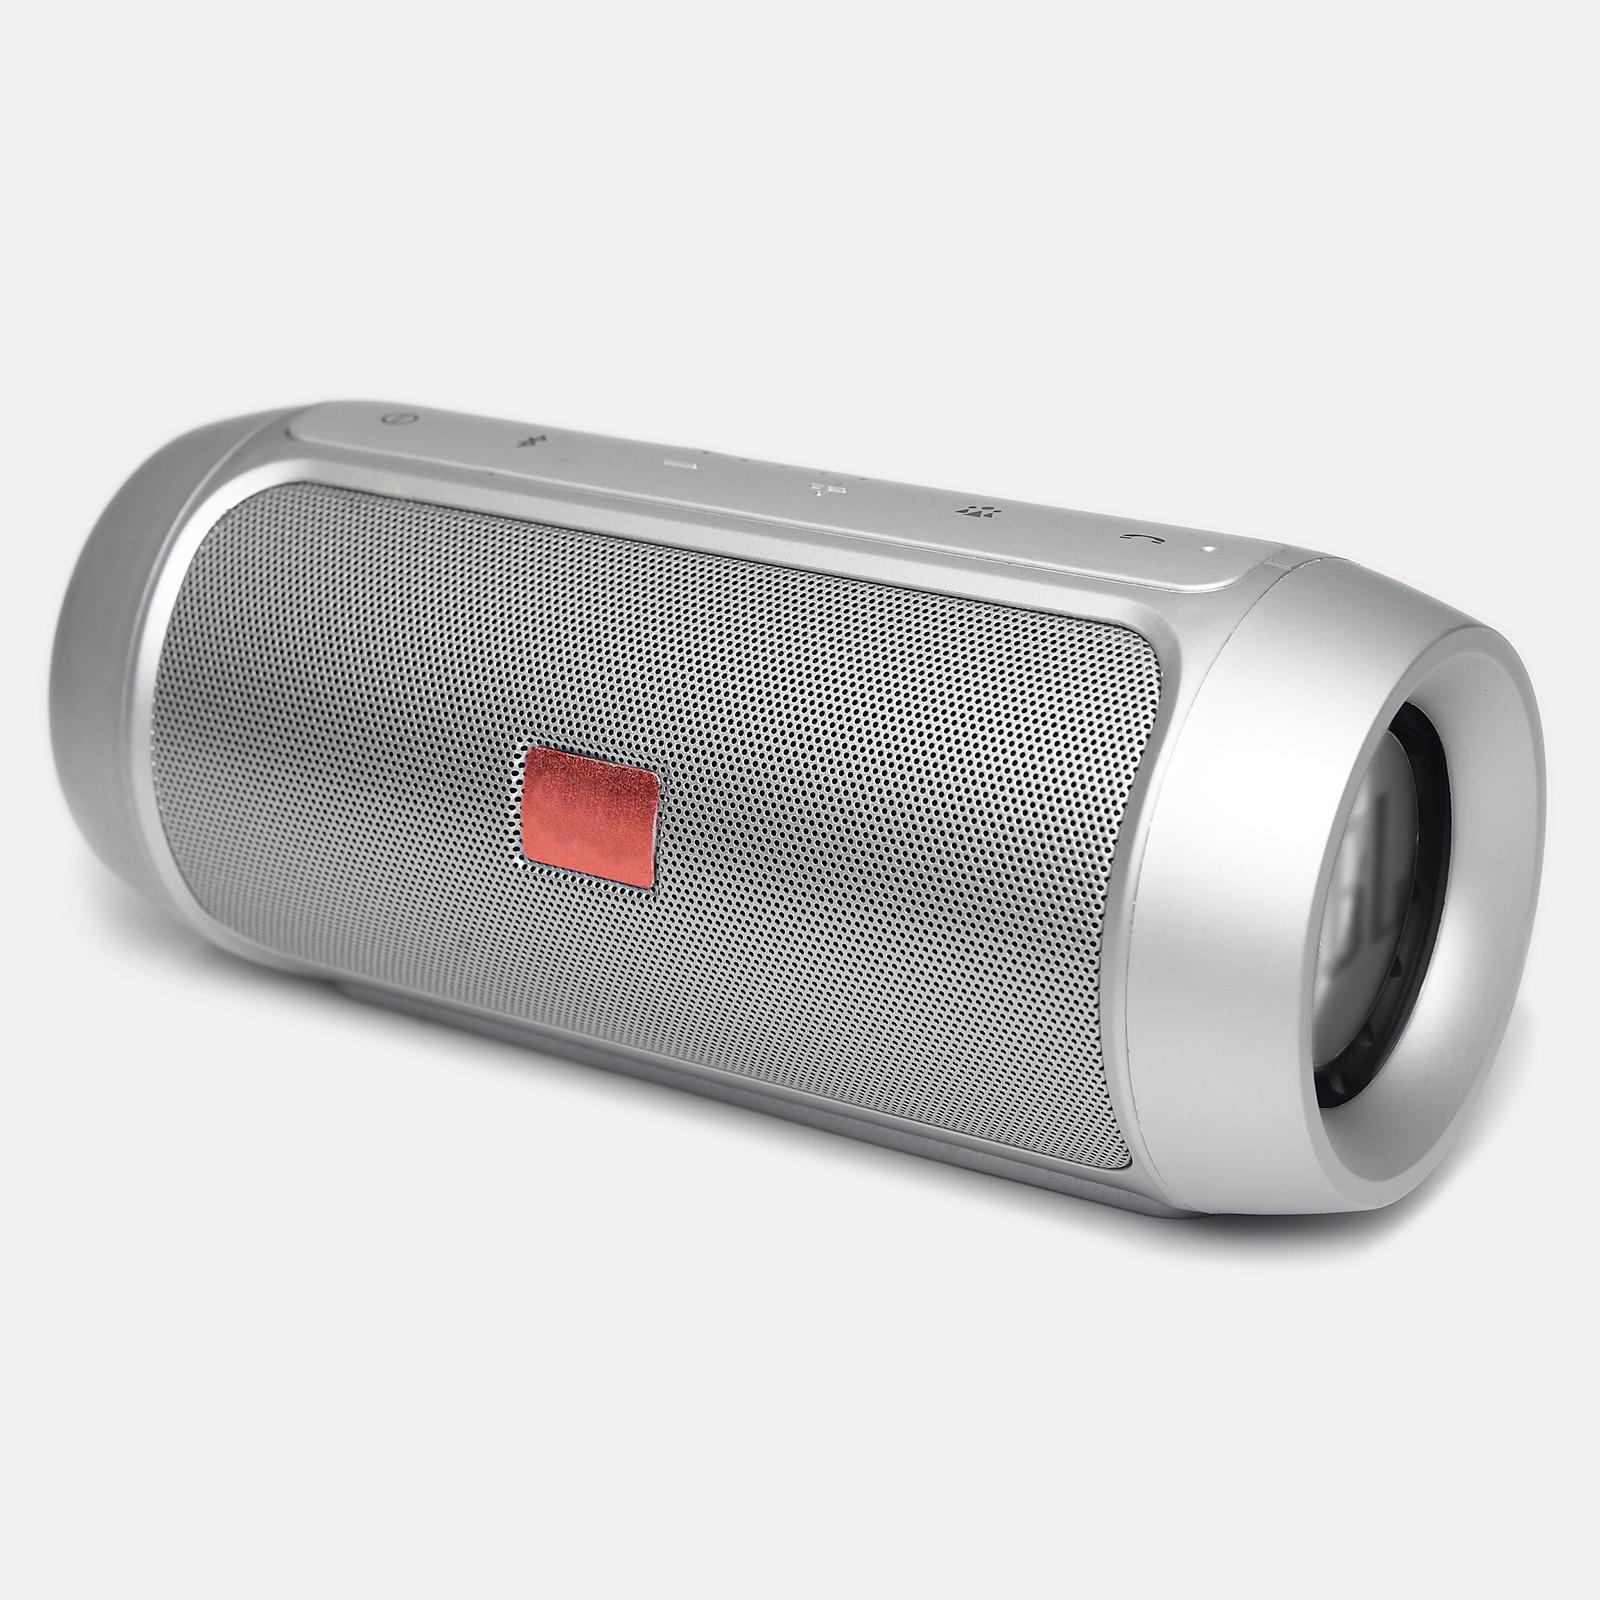 Портативная колонка JBL Charge 2+ Silver High Copy